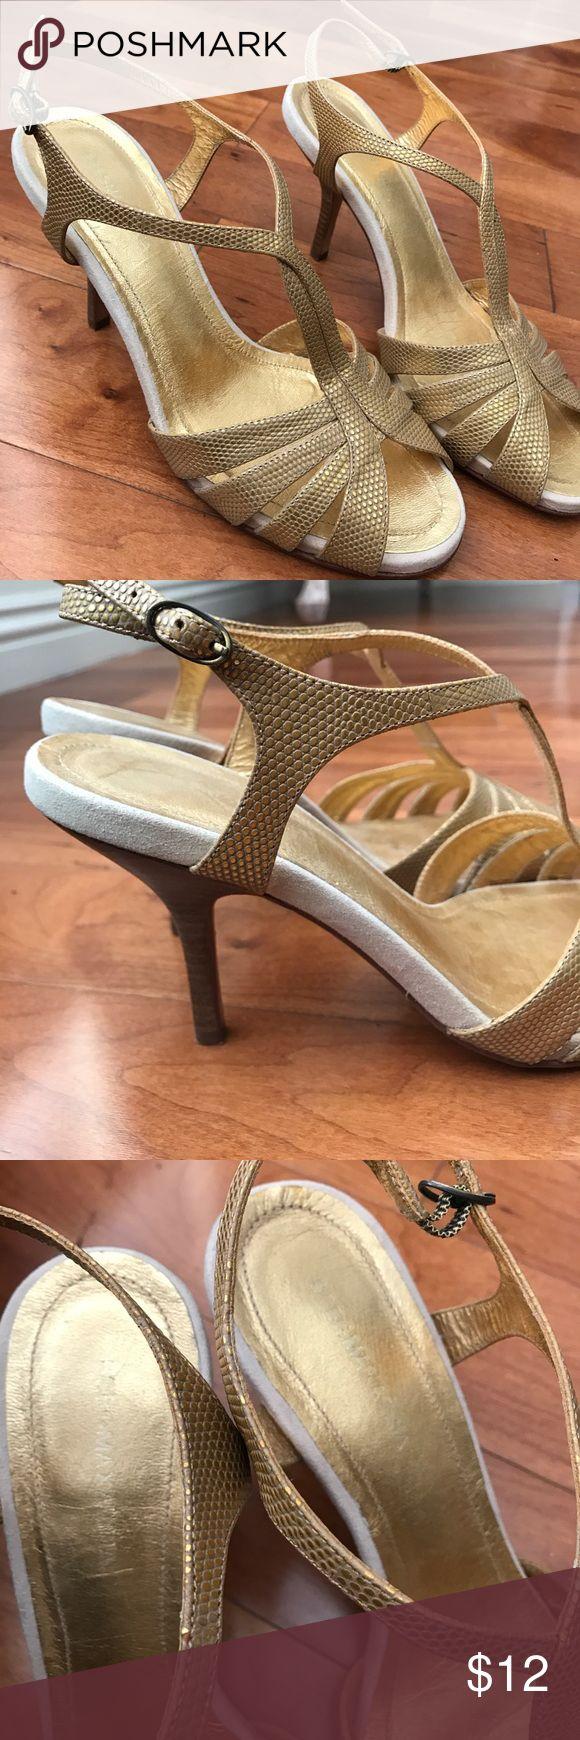 "BCBG gold sandal heels Snake skin look gold sandal heels from BCBG. All leather. About 1.5-2"" heels. Super comfortable, good condition. BCBG Shoes Sandals"